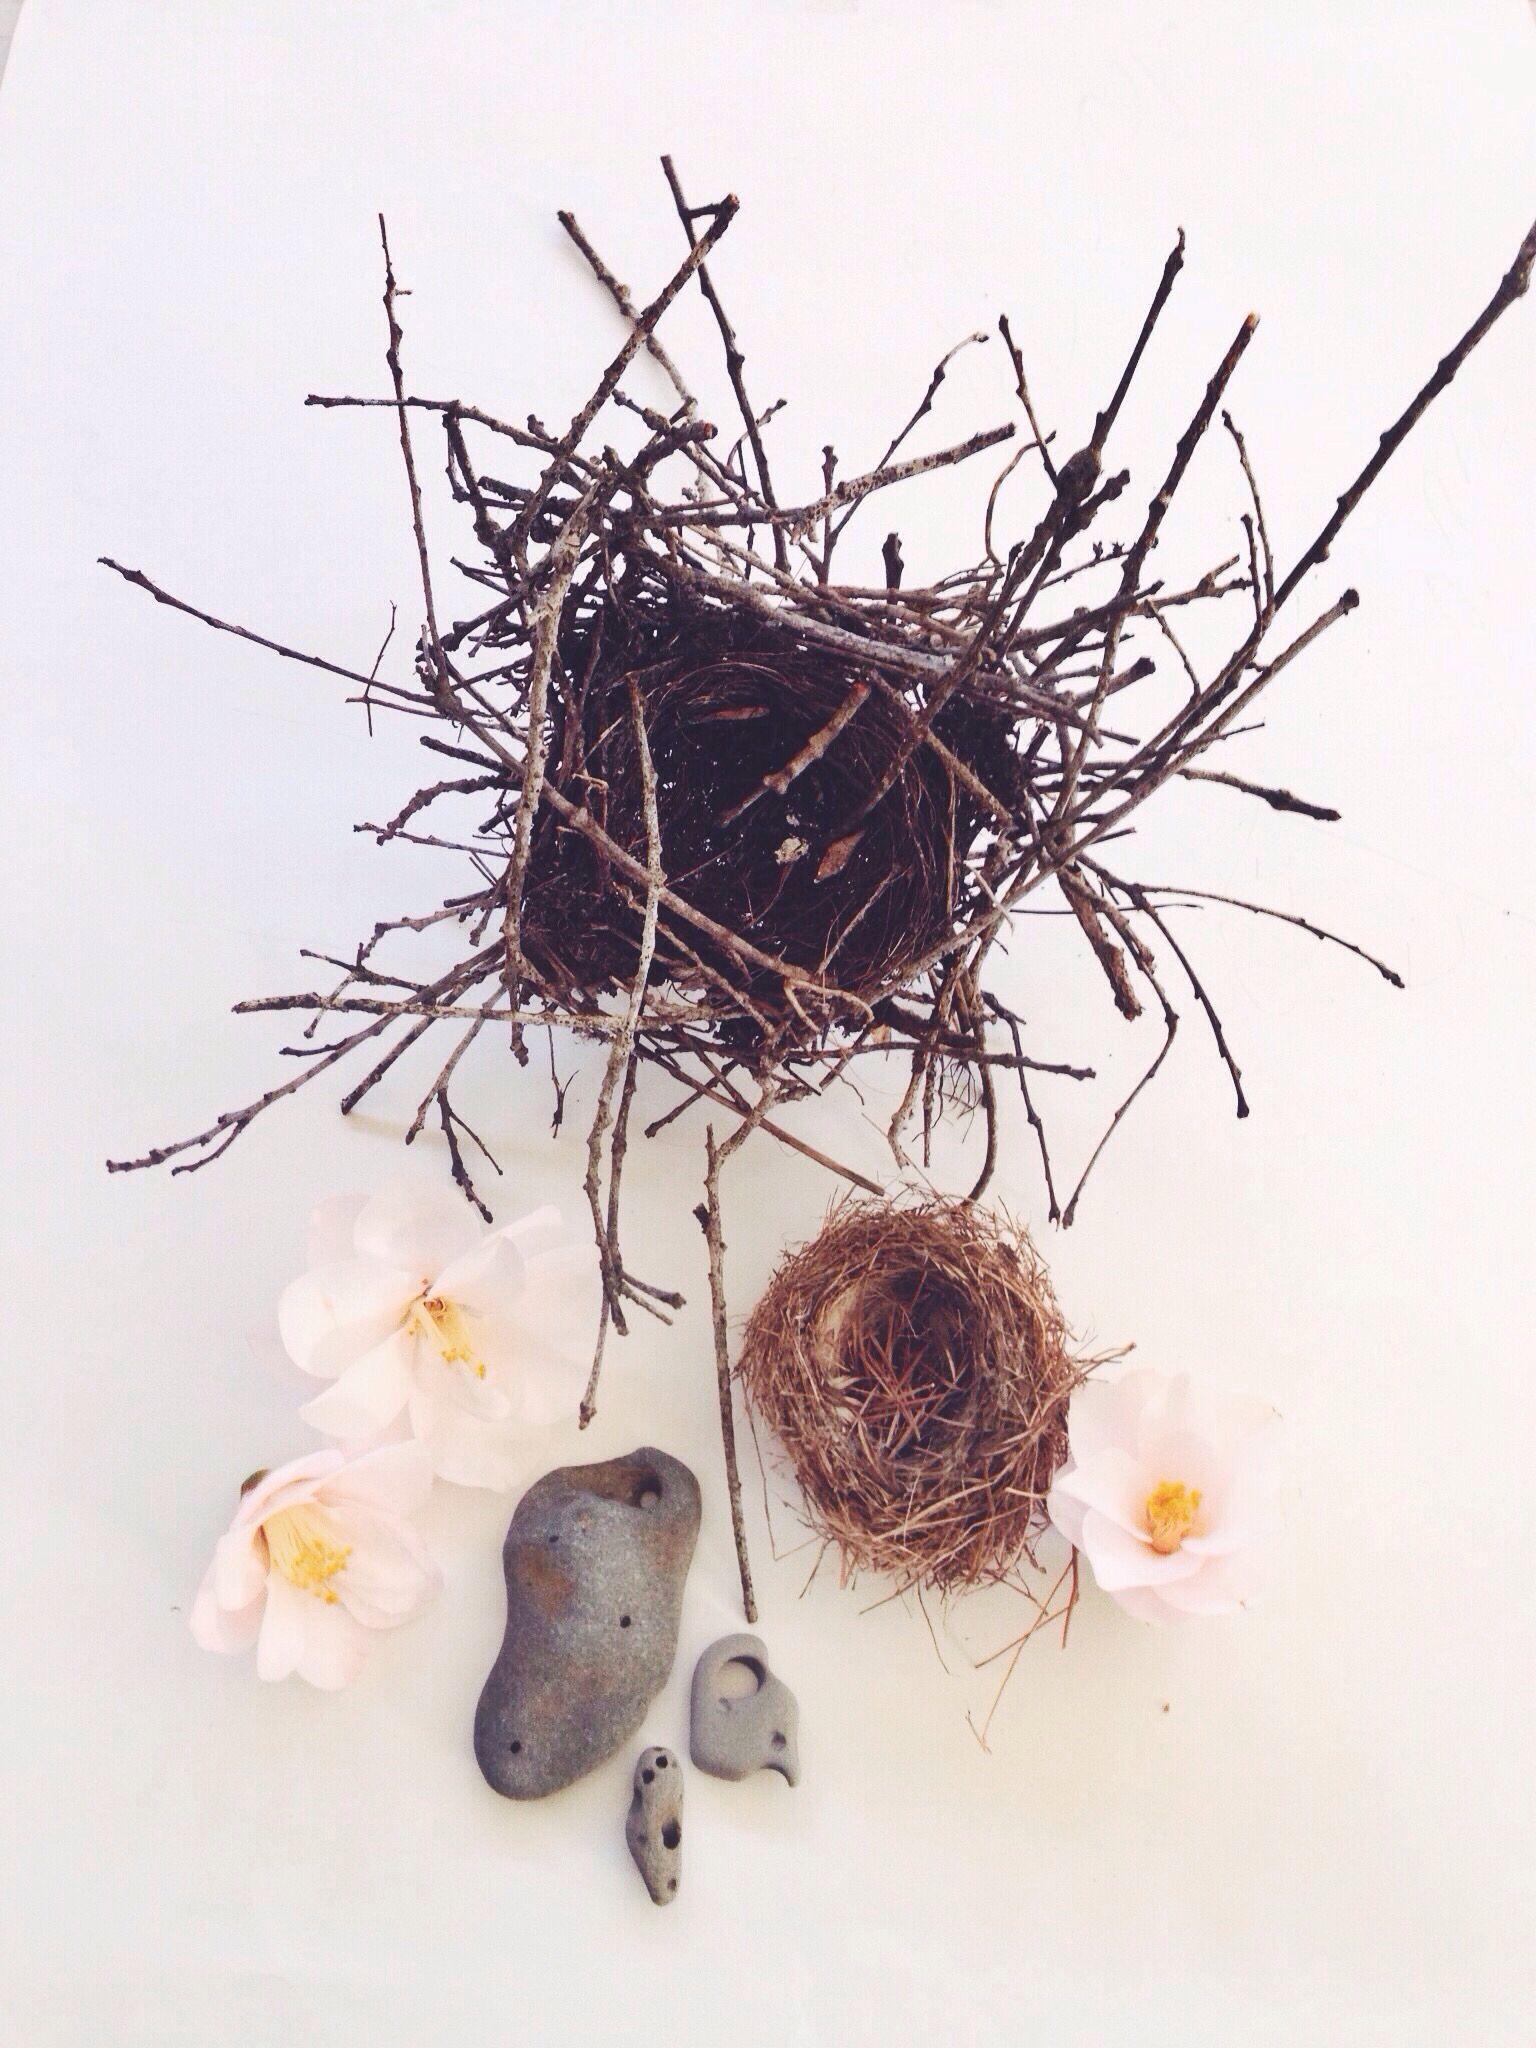 Birds nests, Camellias, and Holey stones @wildthorne on Instagram